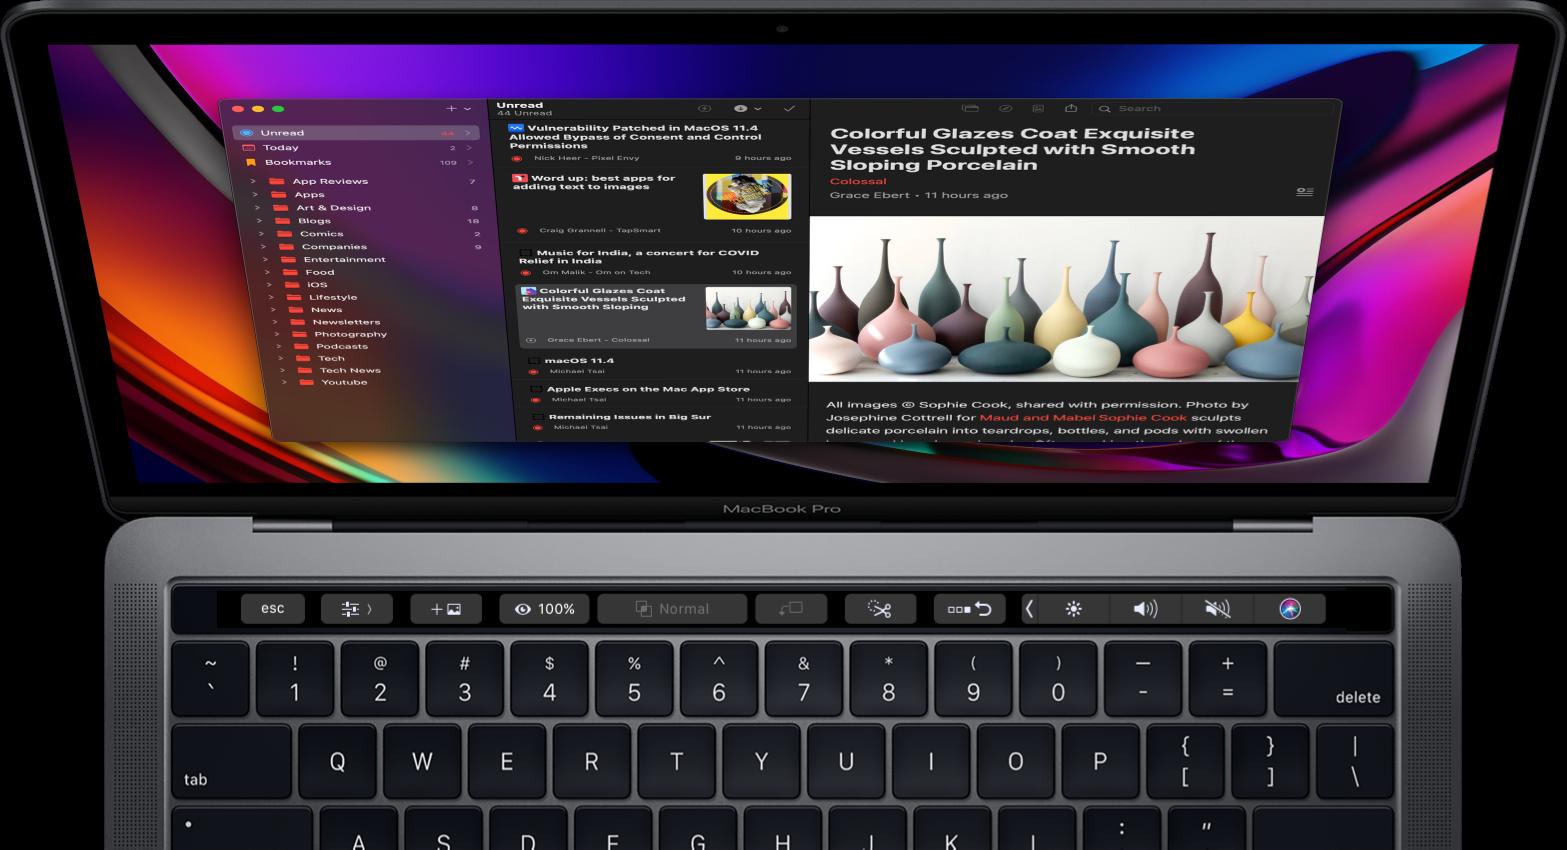 Elytra version 2.3.2 running on a Macbook Pro in dark mode.